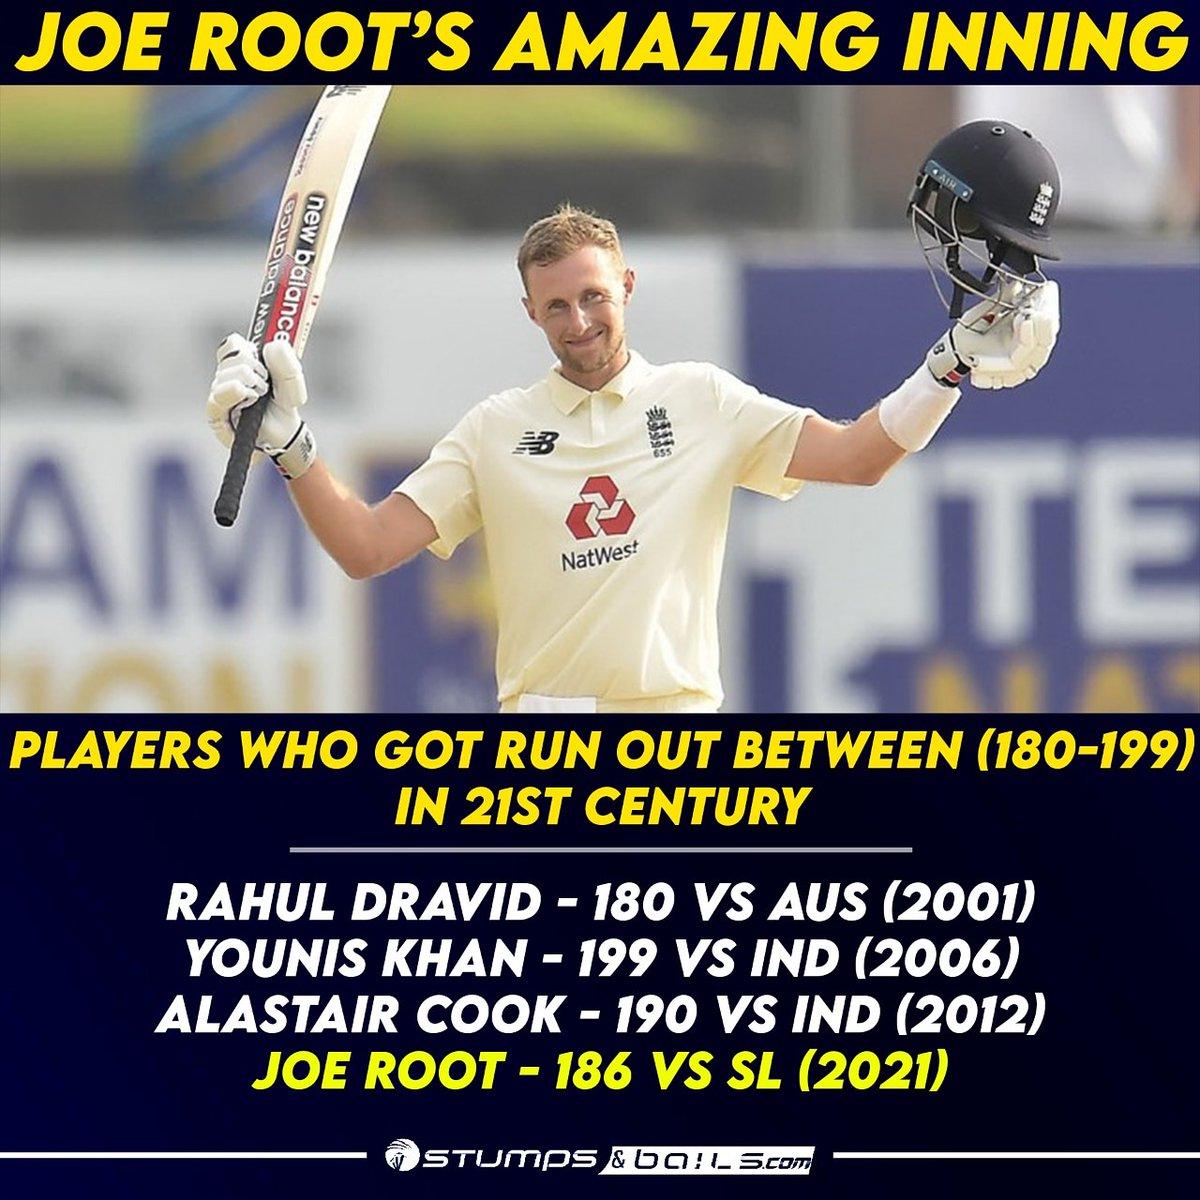 @root66 missed out second successive double century  Follow us @stumpnbails #TestCricket #IndvsEng #IndianCricketTeam #TeamIndia #AjinkyaRahane #IPL #ipl2021  #iplretention #SLvsENG #slvseng2021 #engvssl #Cricket #joeroot